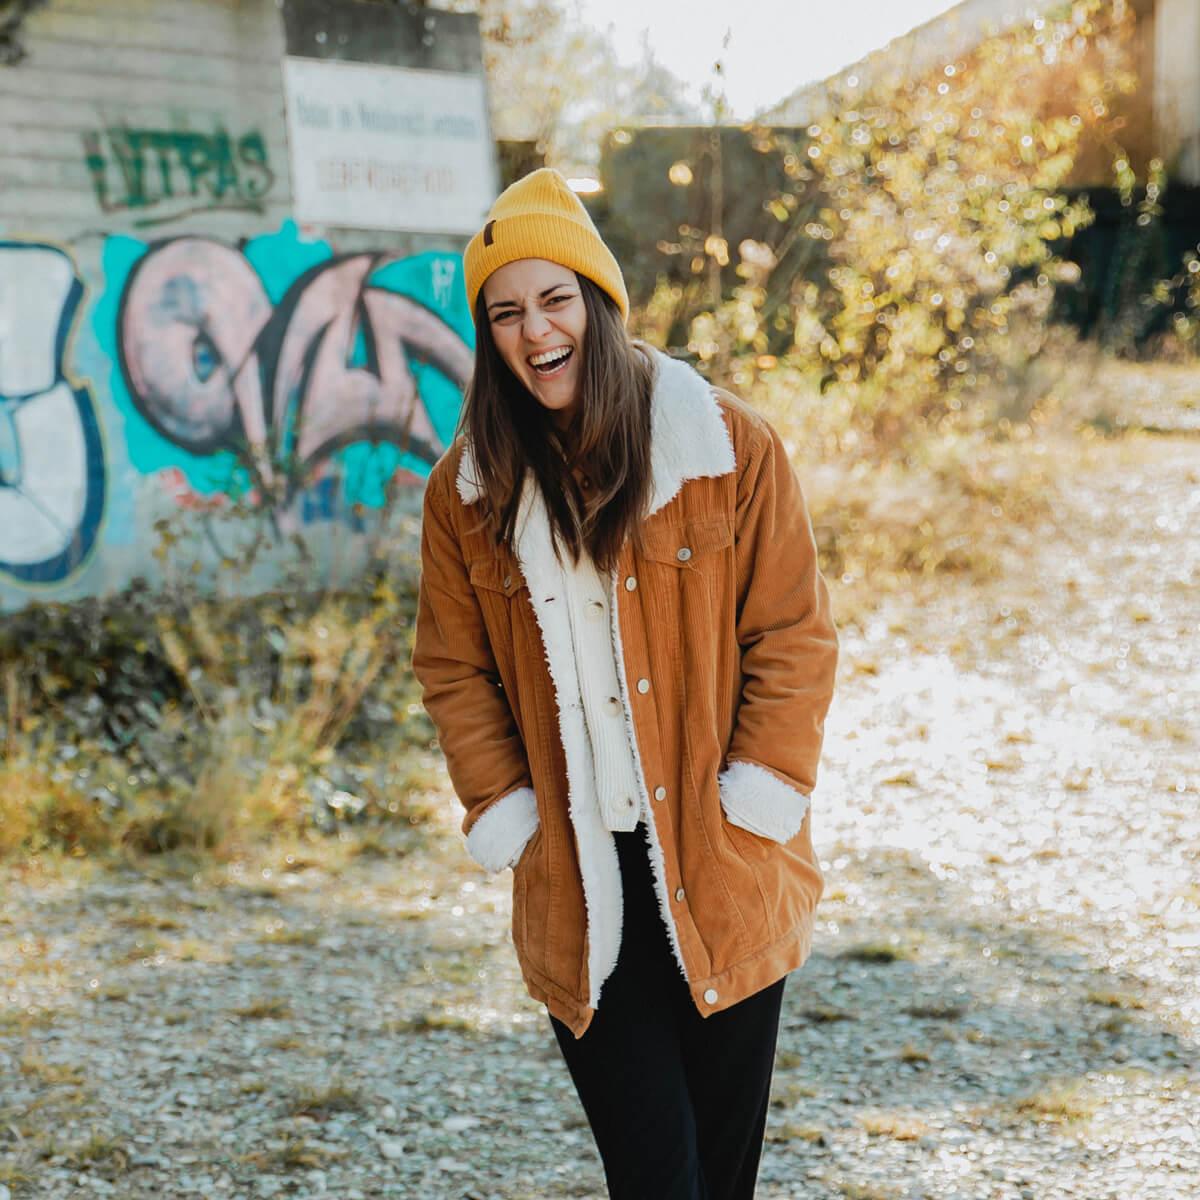 Herbstsonne-lachende-Frau-vor-Graffitti